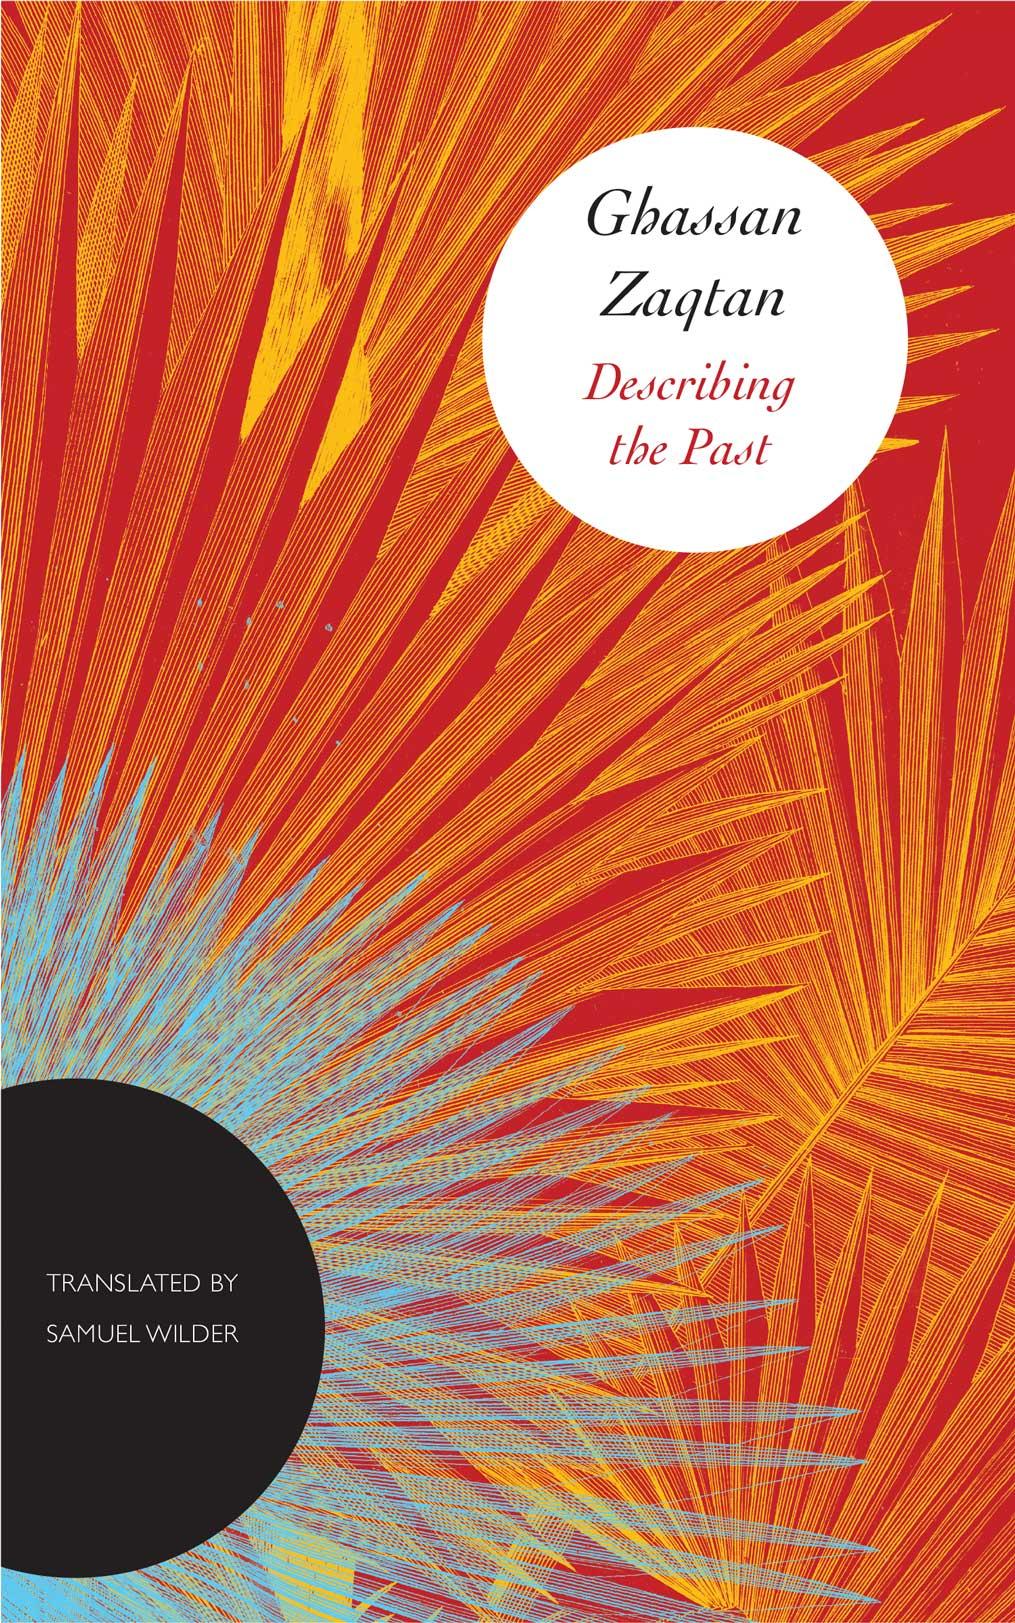 Describing the Past by Ghassan Zaqtan | Seagull Books